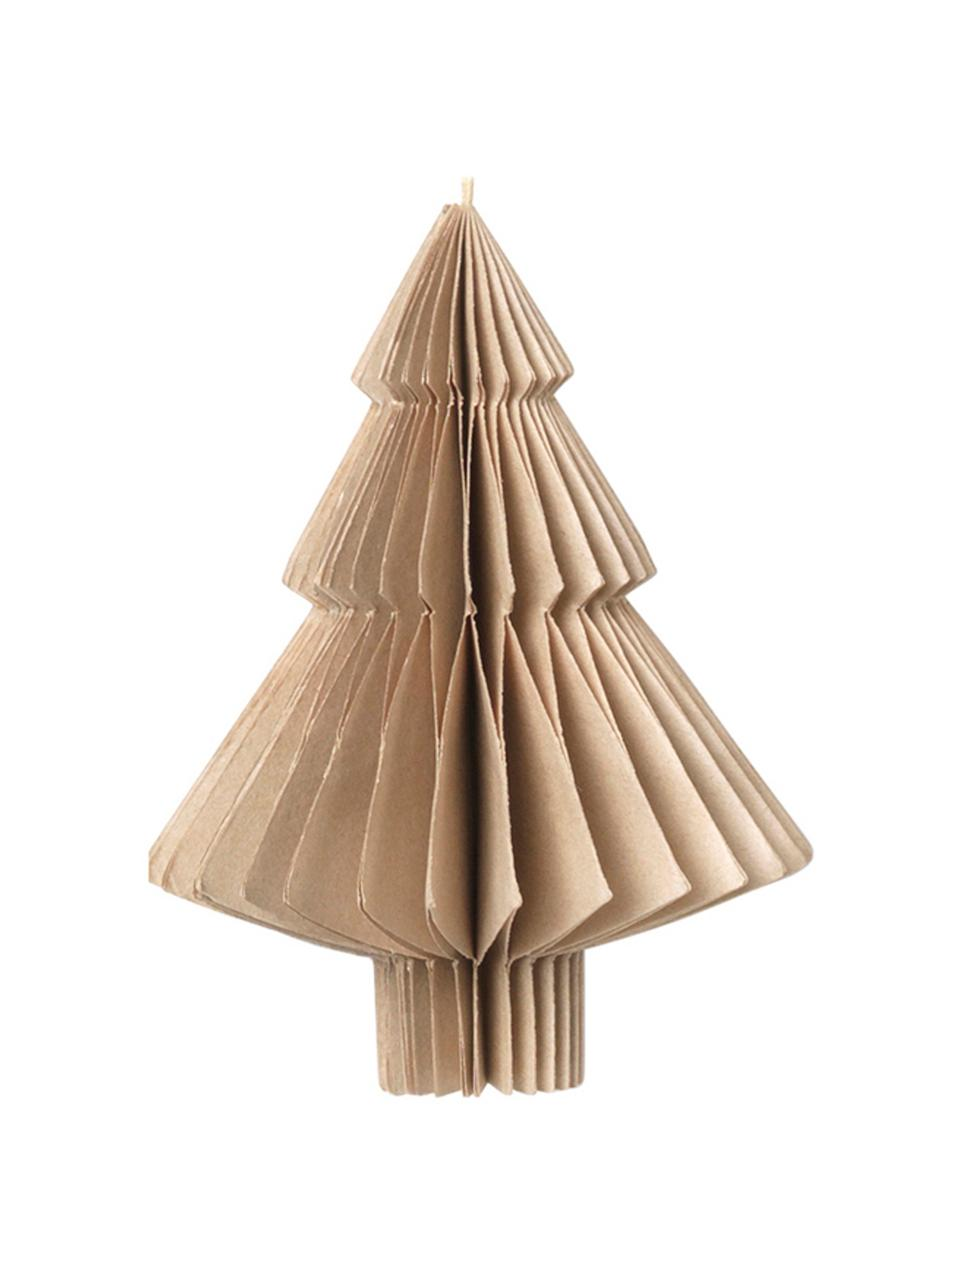 Baumanhänger-Set Christmas Mix, 4-tlg., Papier, Beige, Ø 9 x H 10 cm